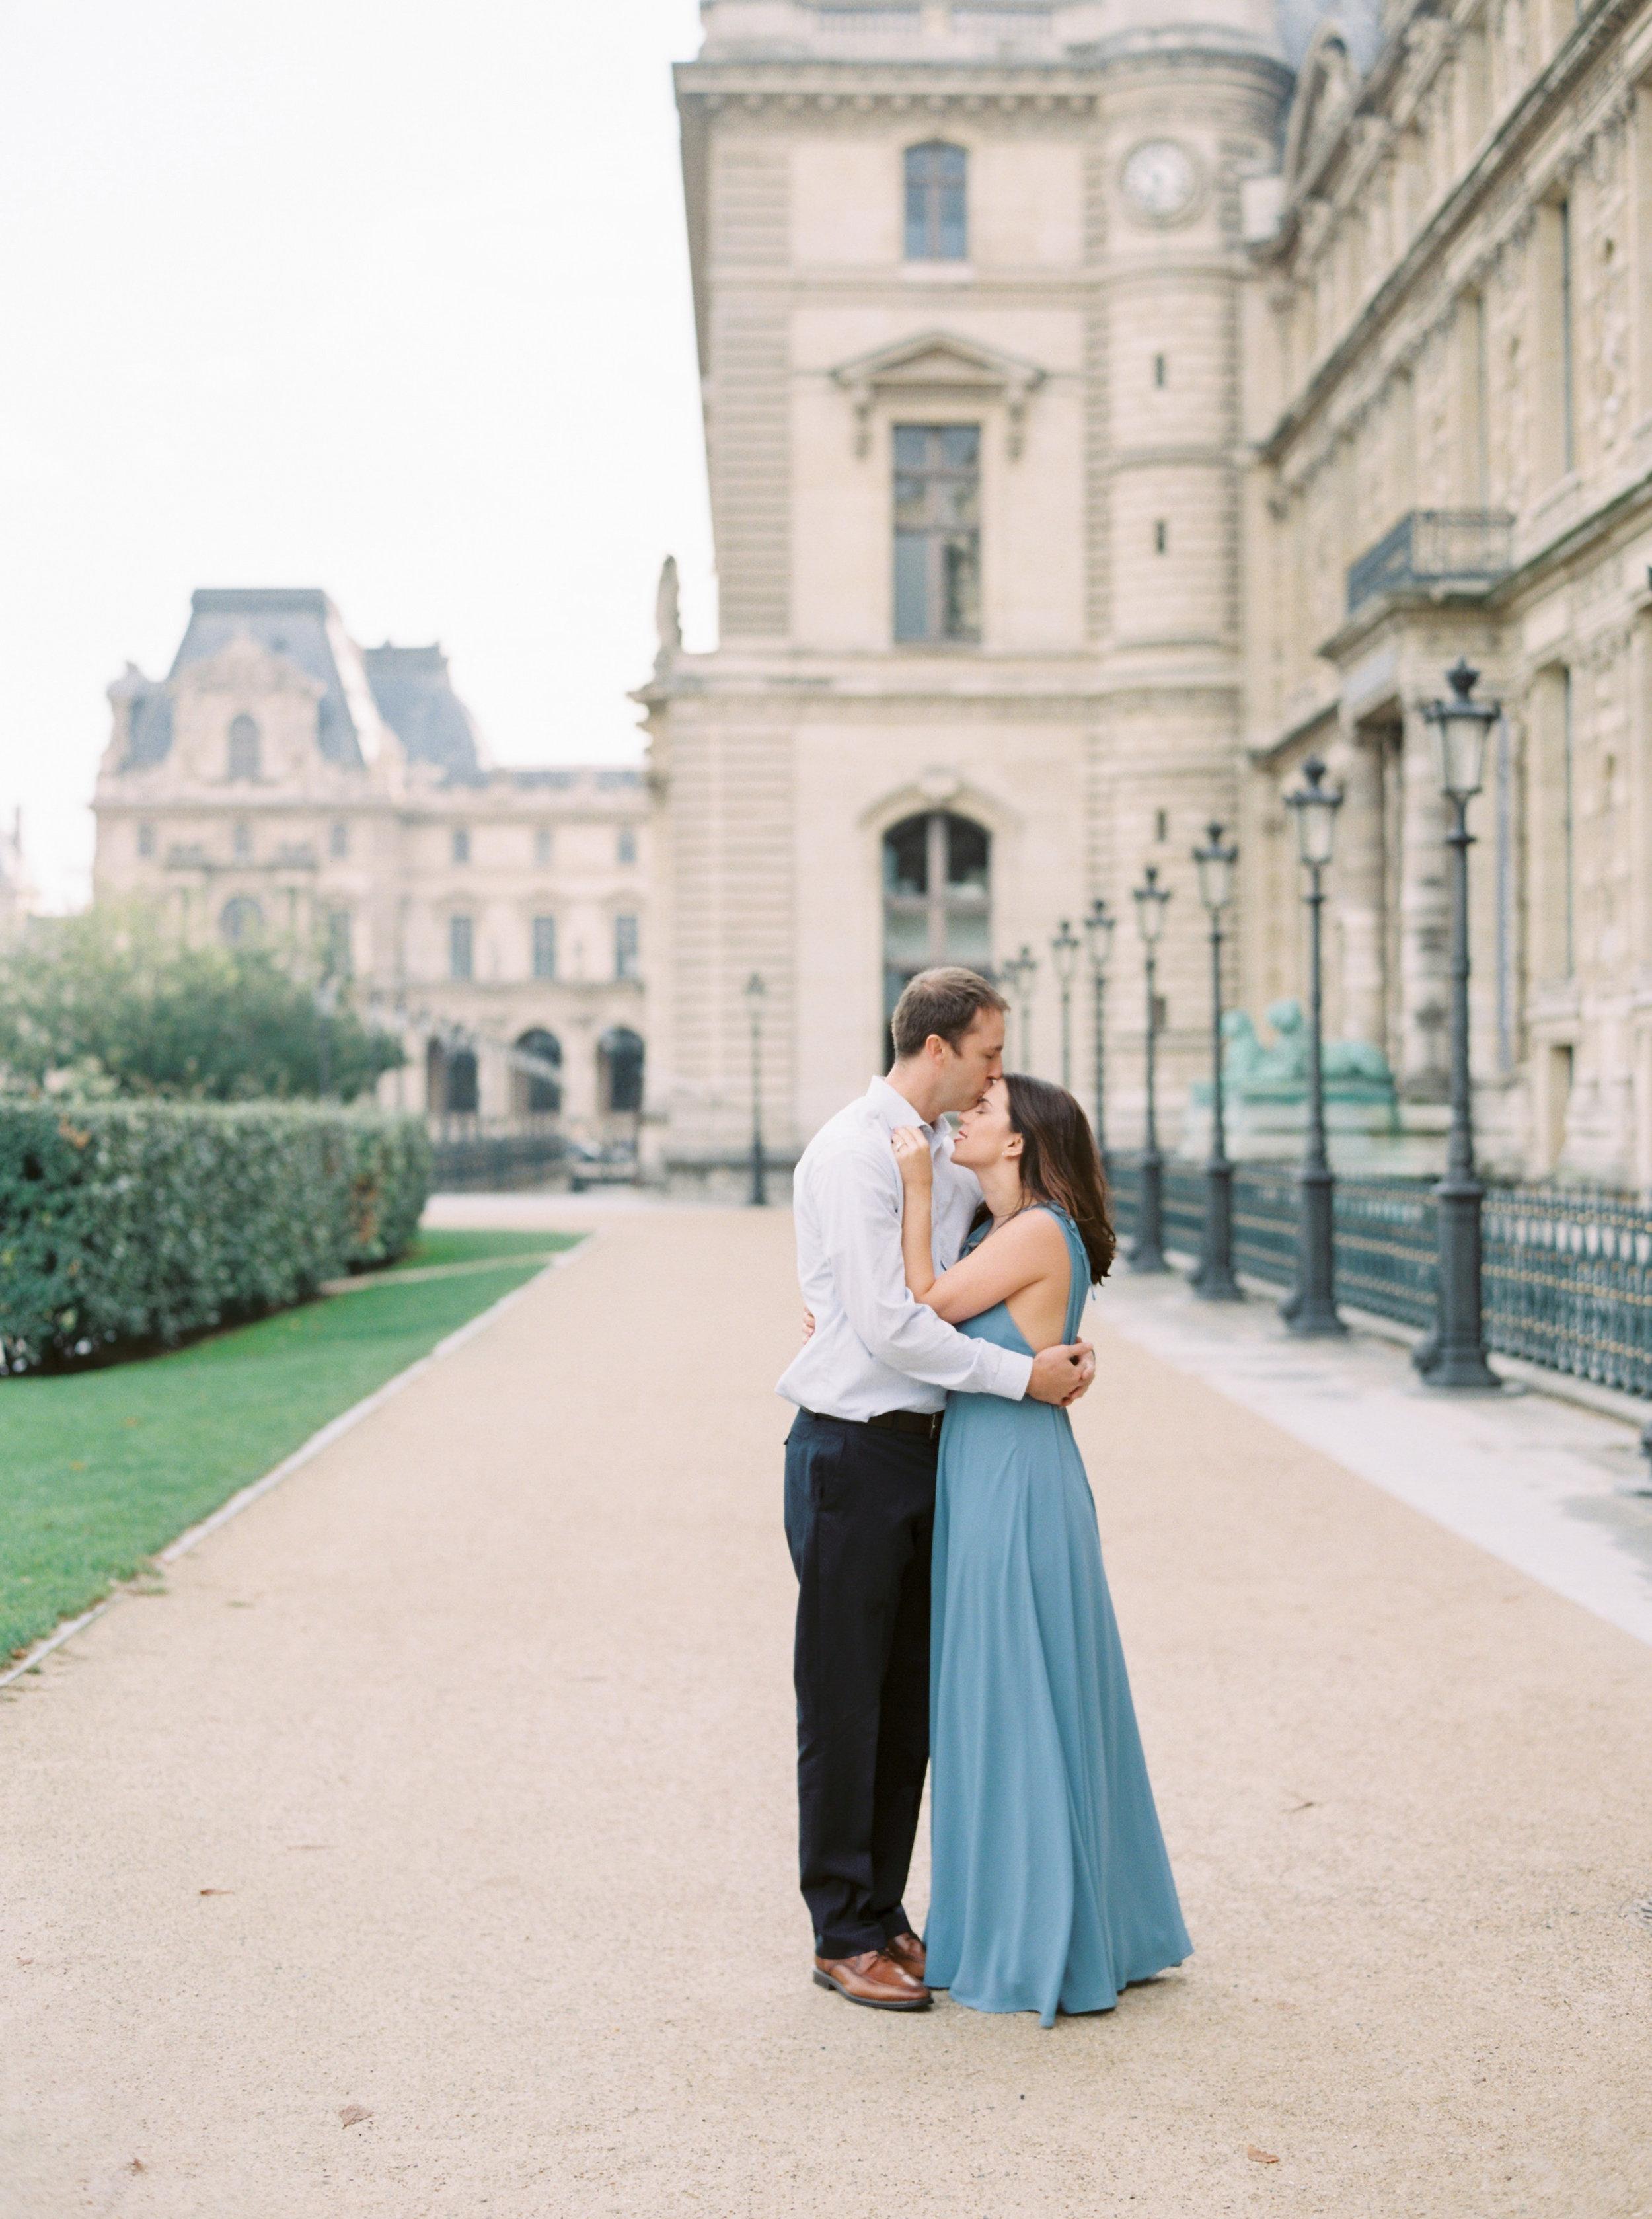 paris-france-wedding-photographer-destination-photographer-84.jpg